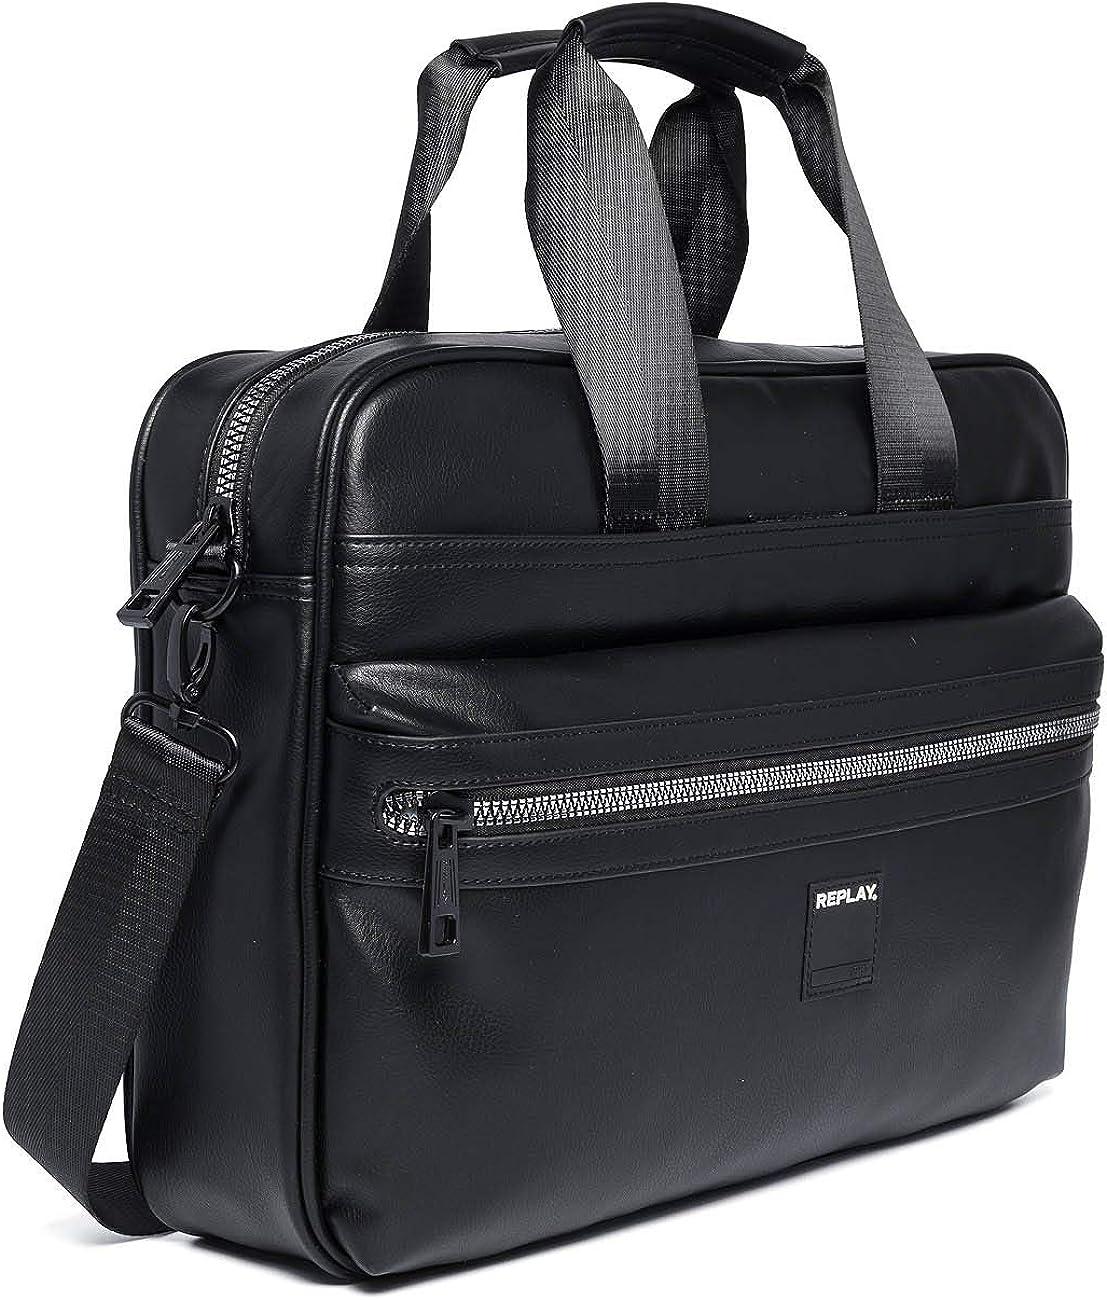 Replay Laptop Sales results No. 1 Black Bag sale